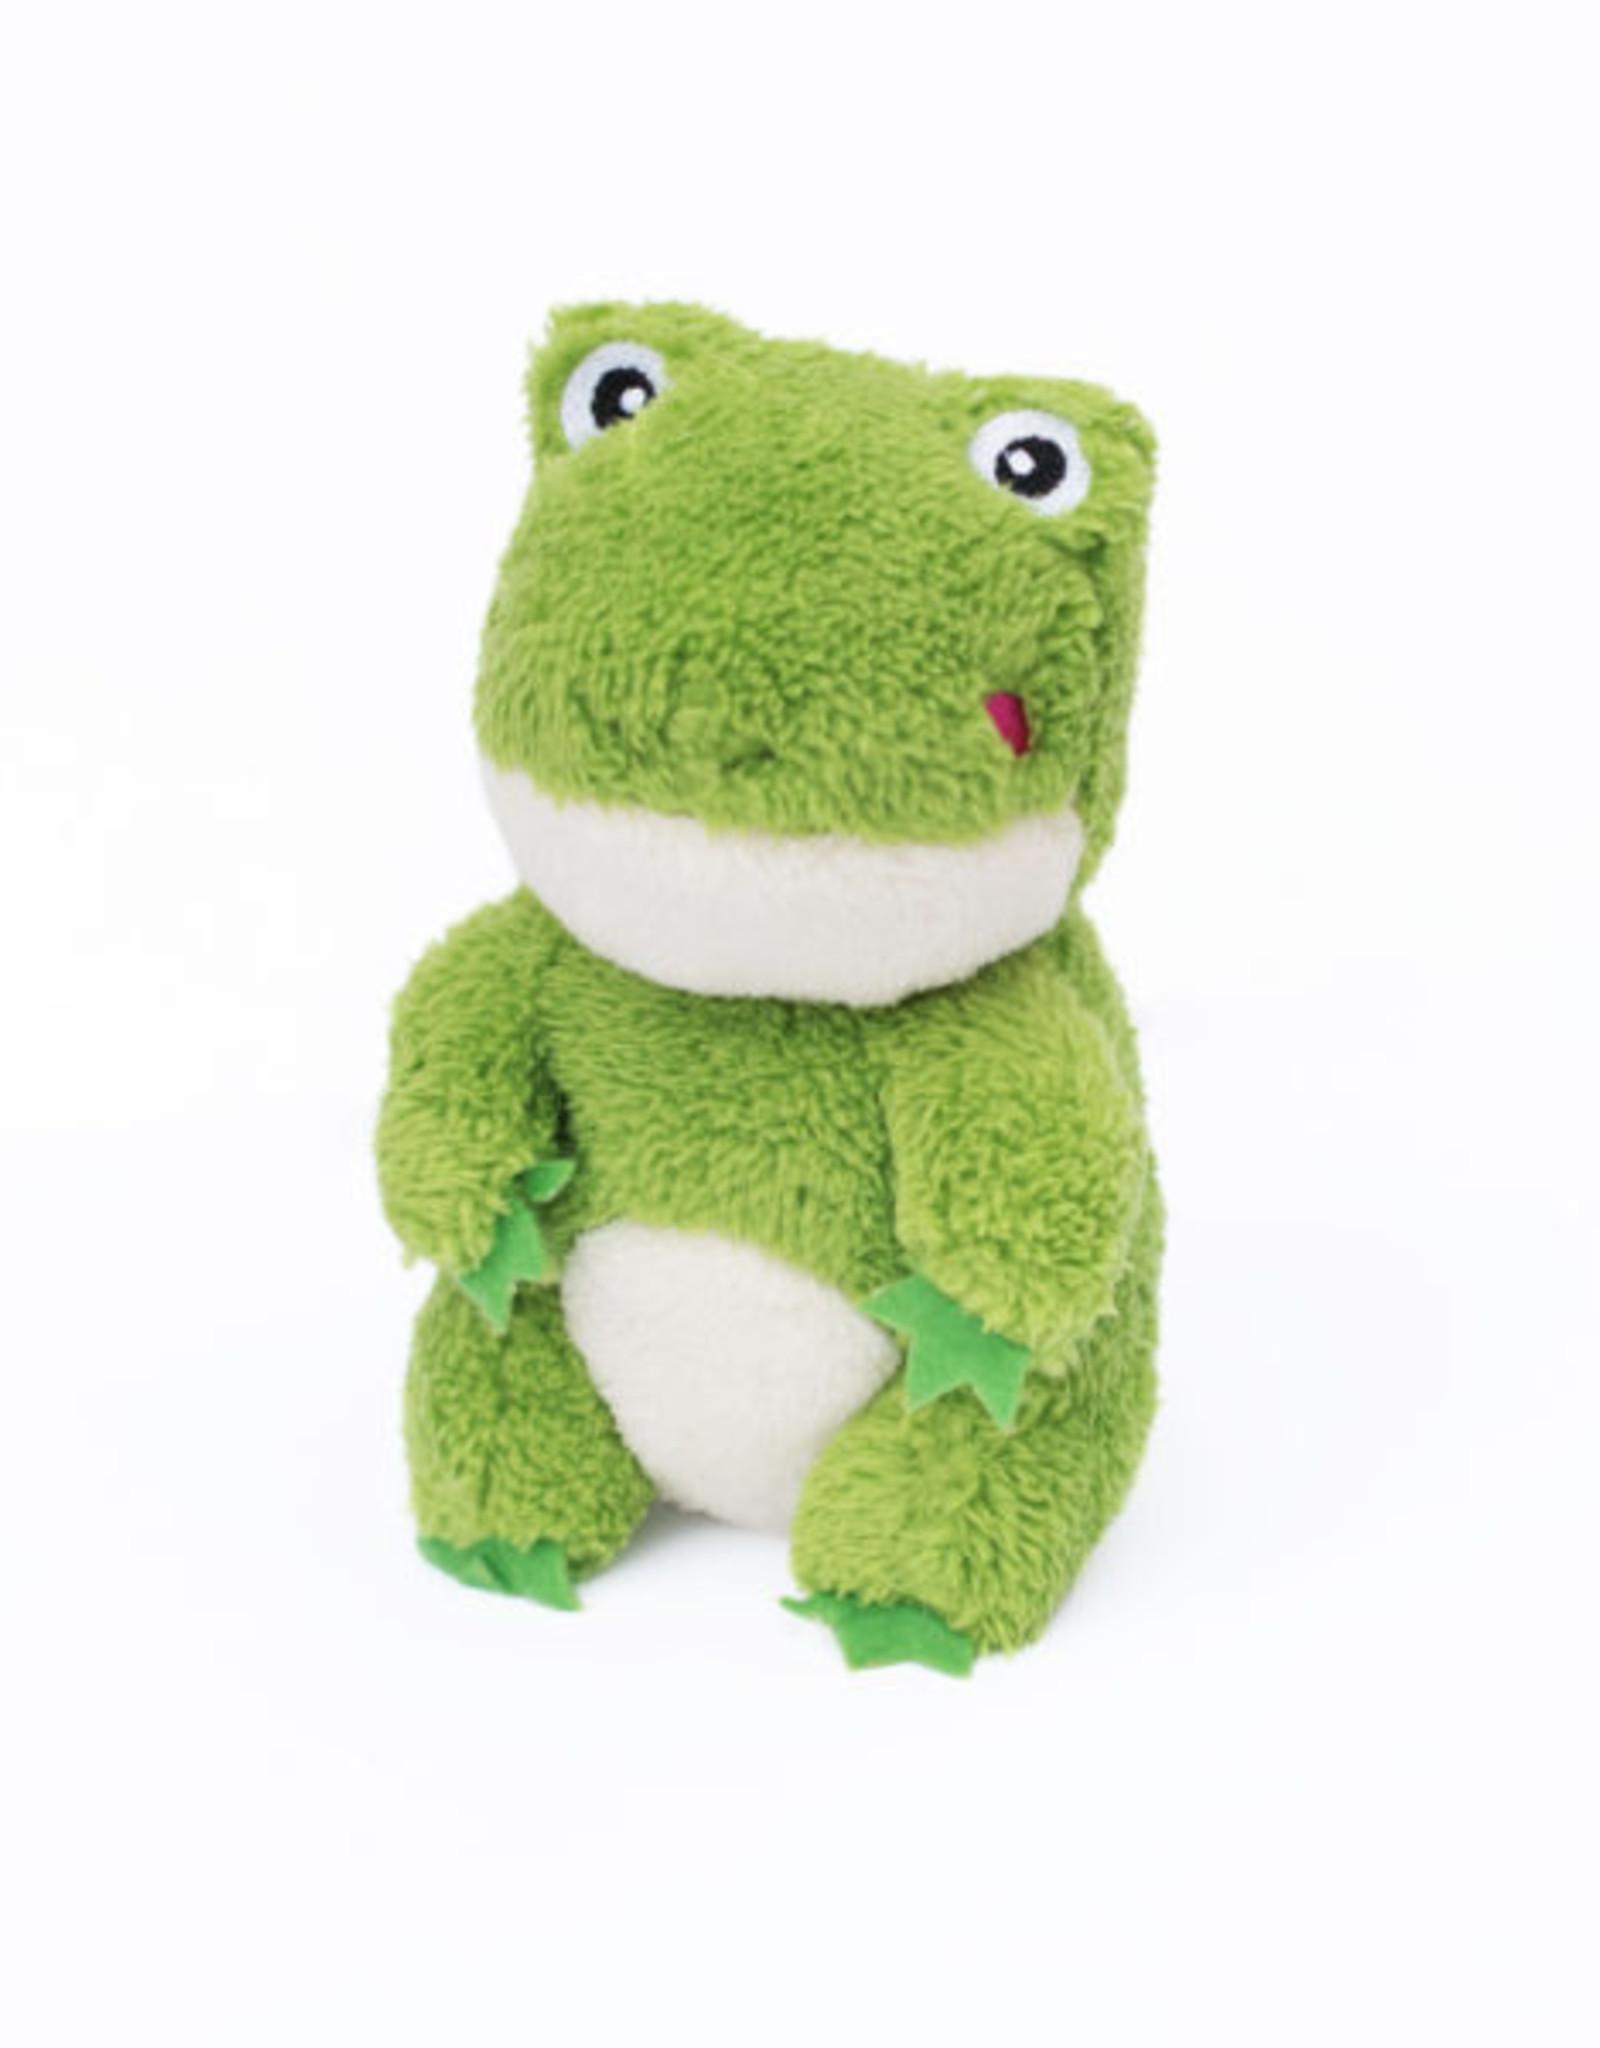 ZippyPaws Cheeky Chumz - Frog